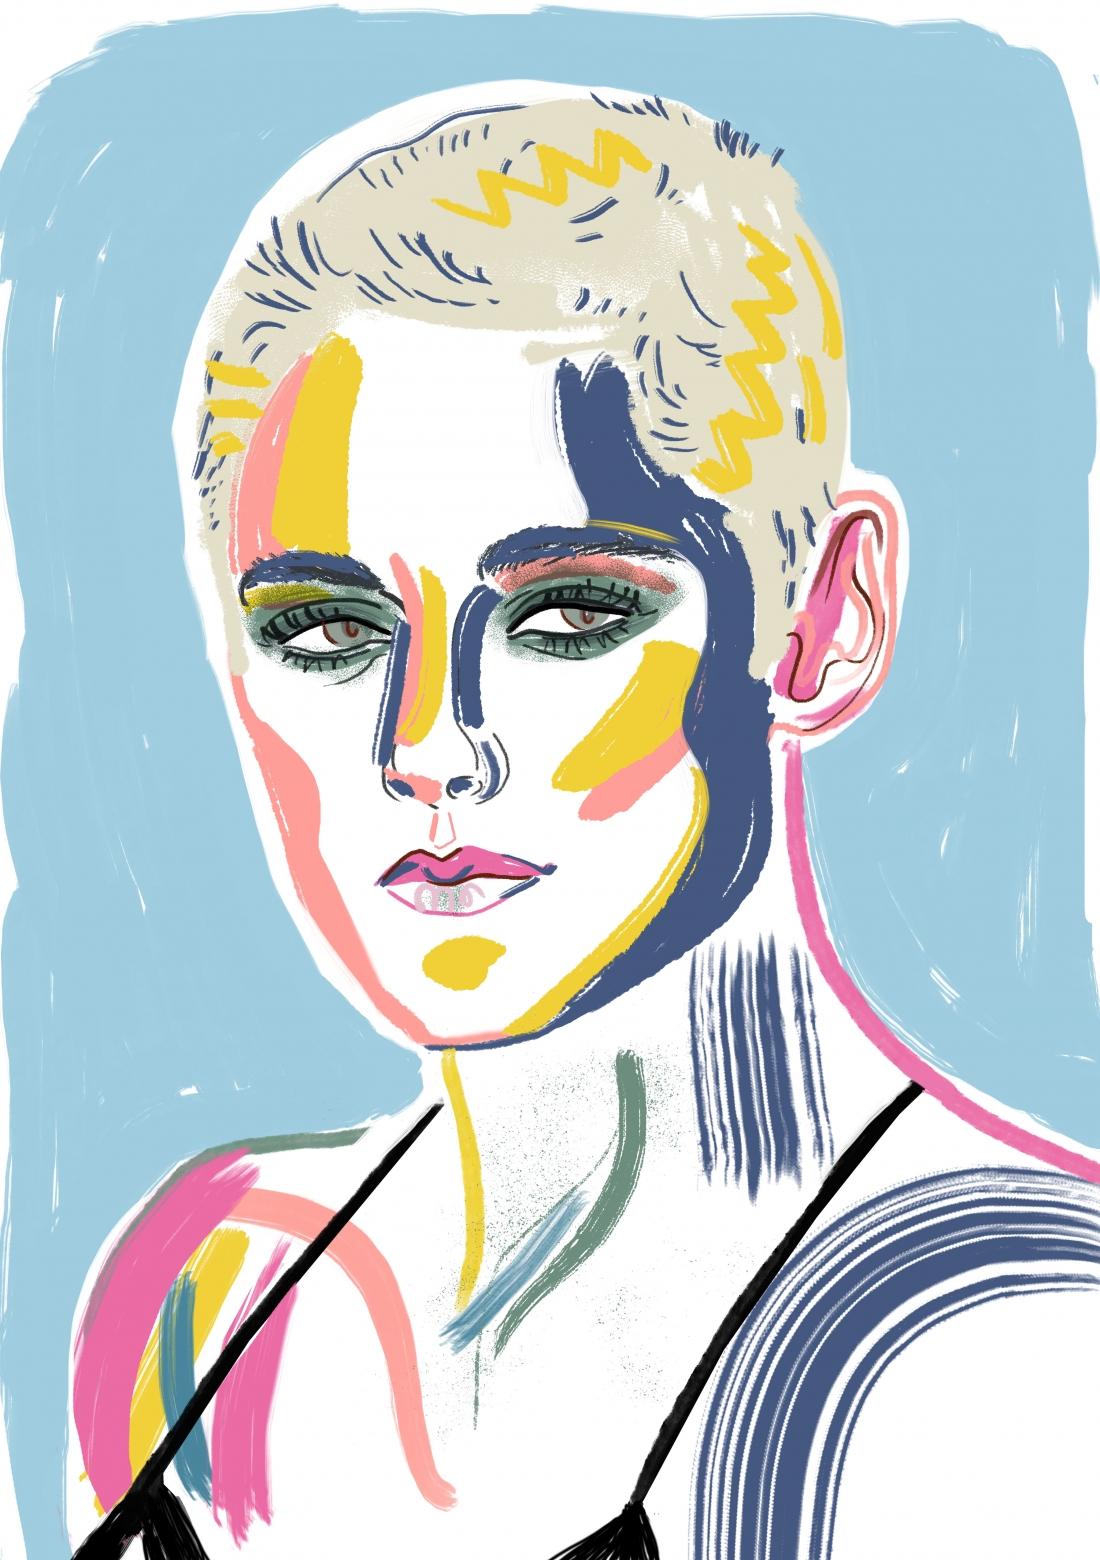 Beautiful editorial illustrations by Sarah Tanat Jones